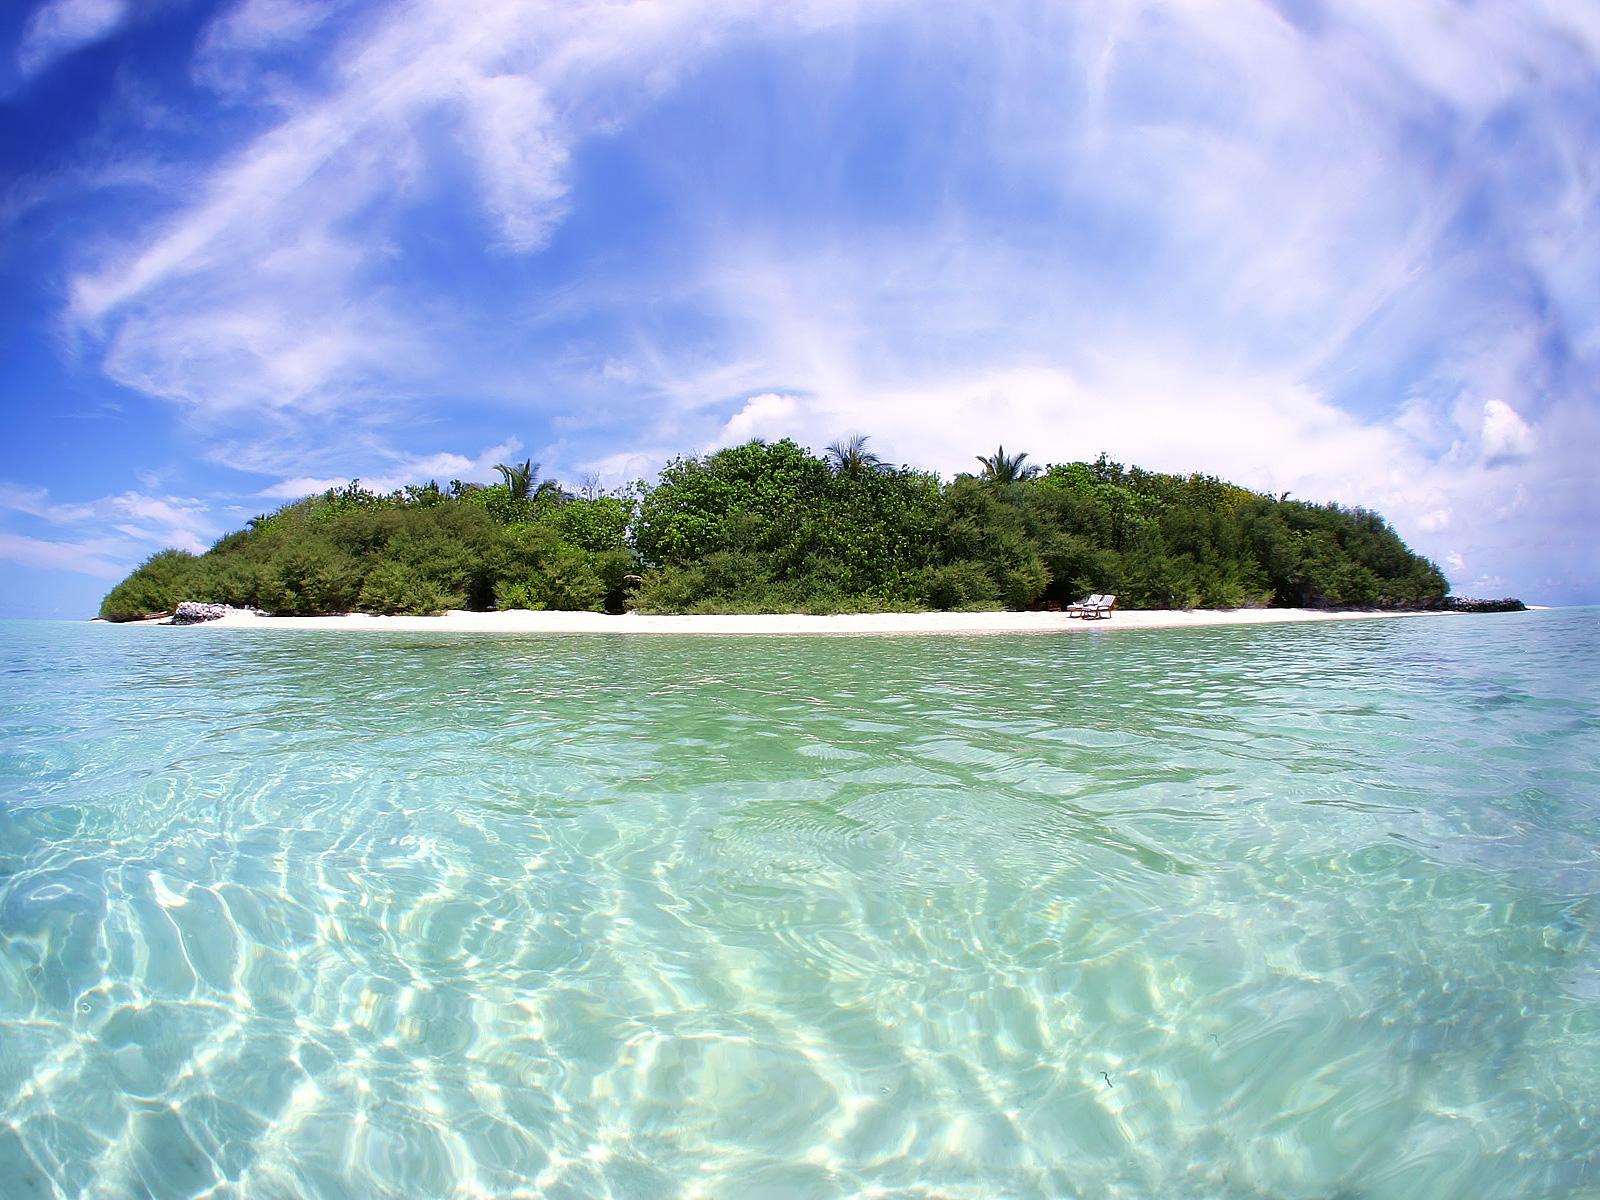 1600x1200 Maldives island desktop PC and Mac wallpaper